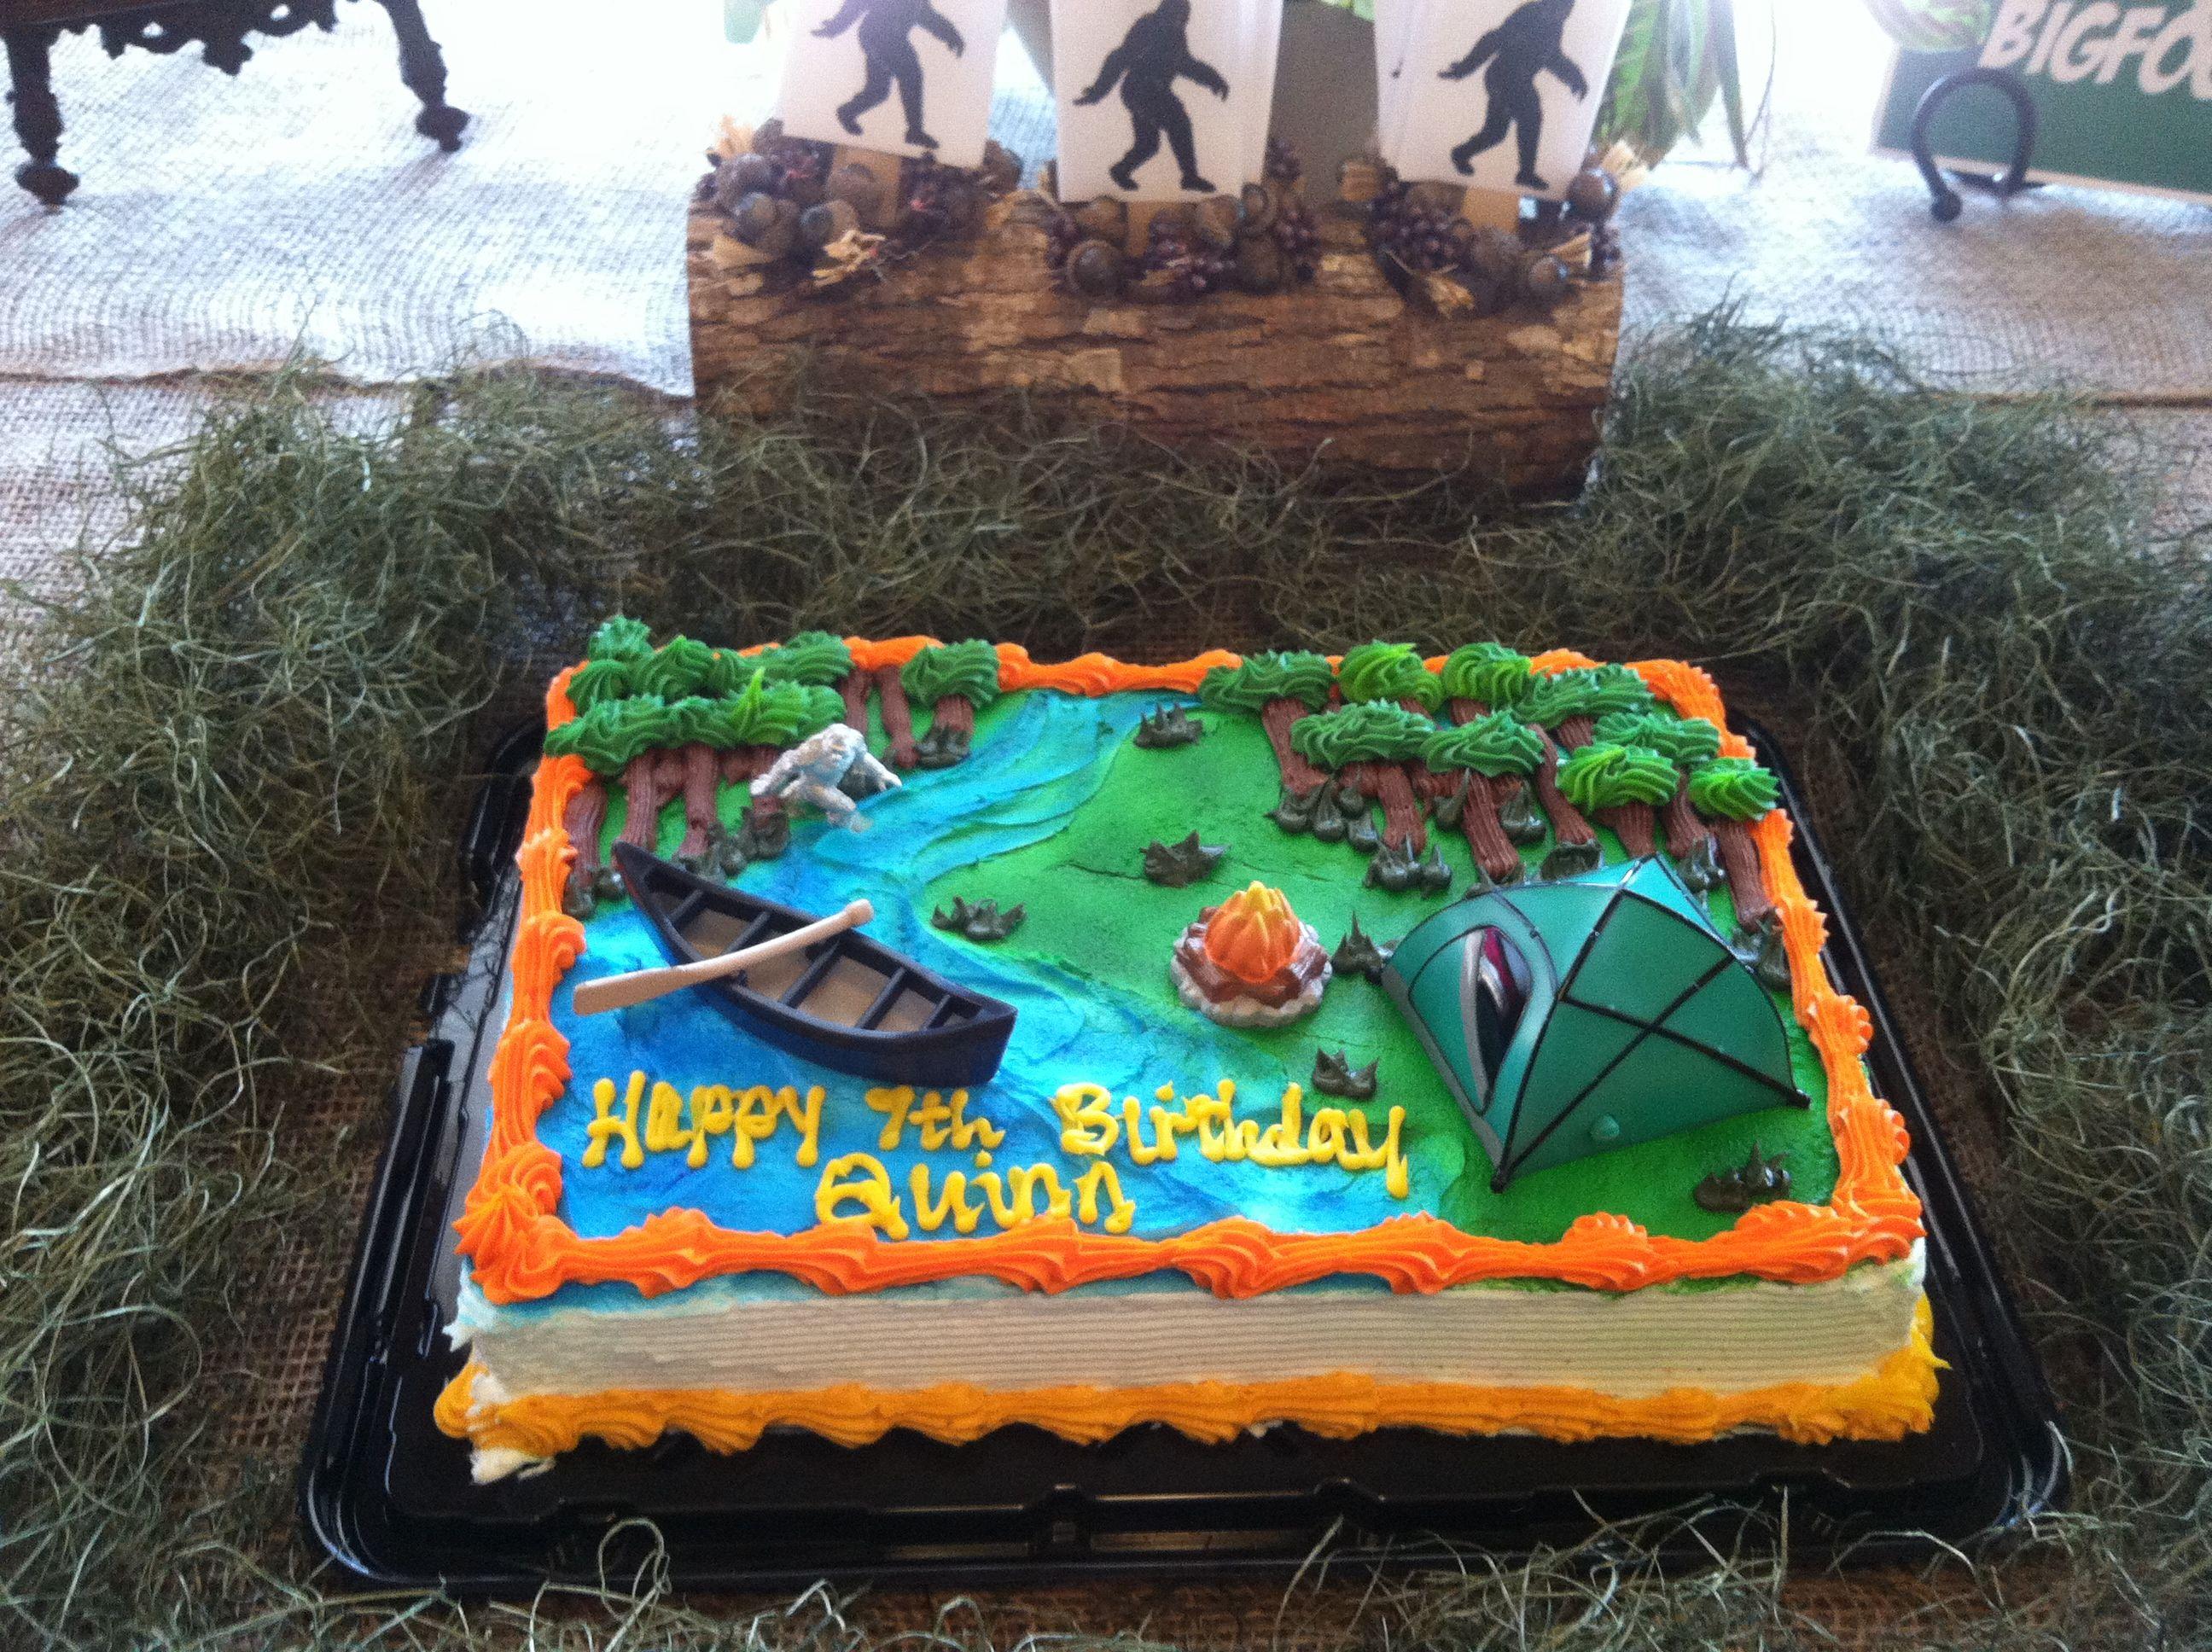 Local Bakery Birthday Cakes Cake Recipe